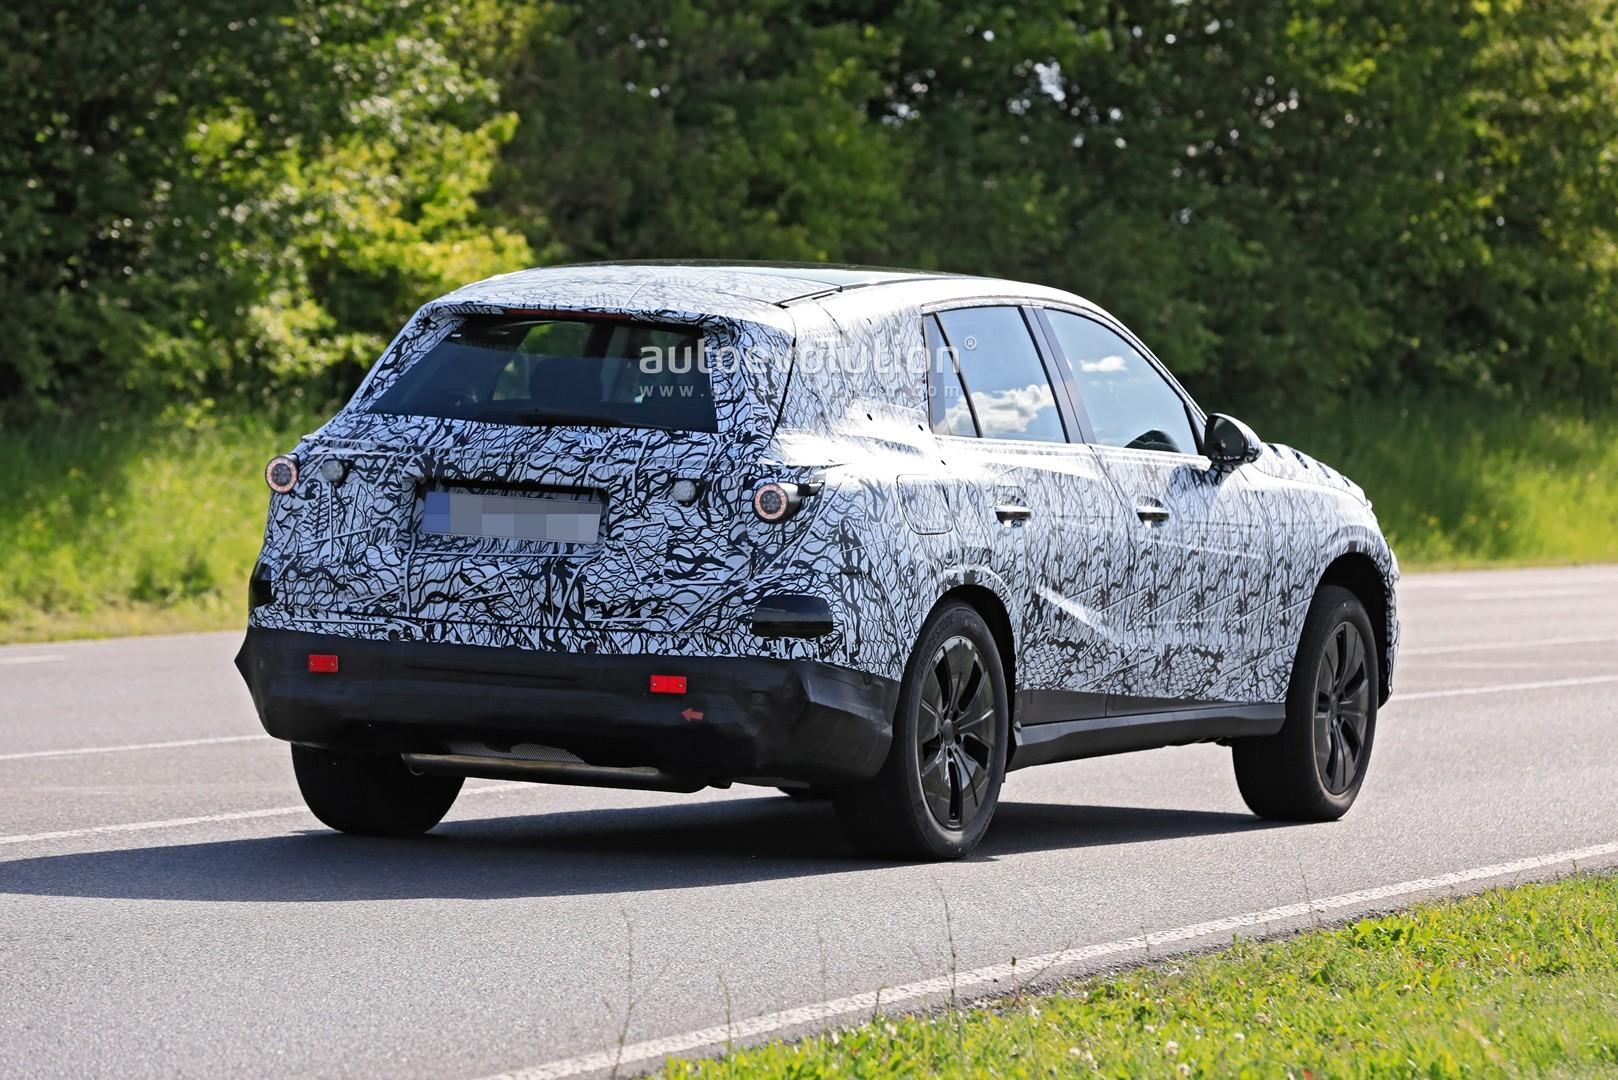 2021 - [Mercedes-Benz] GLC II 2022-mercedes-benz-glc-class-spied-up-close-looks-bigger_12